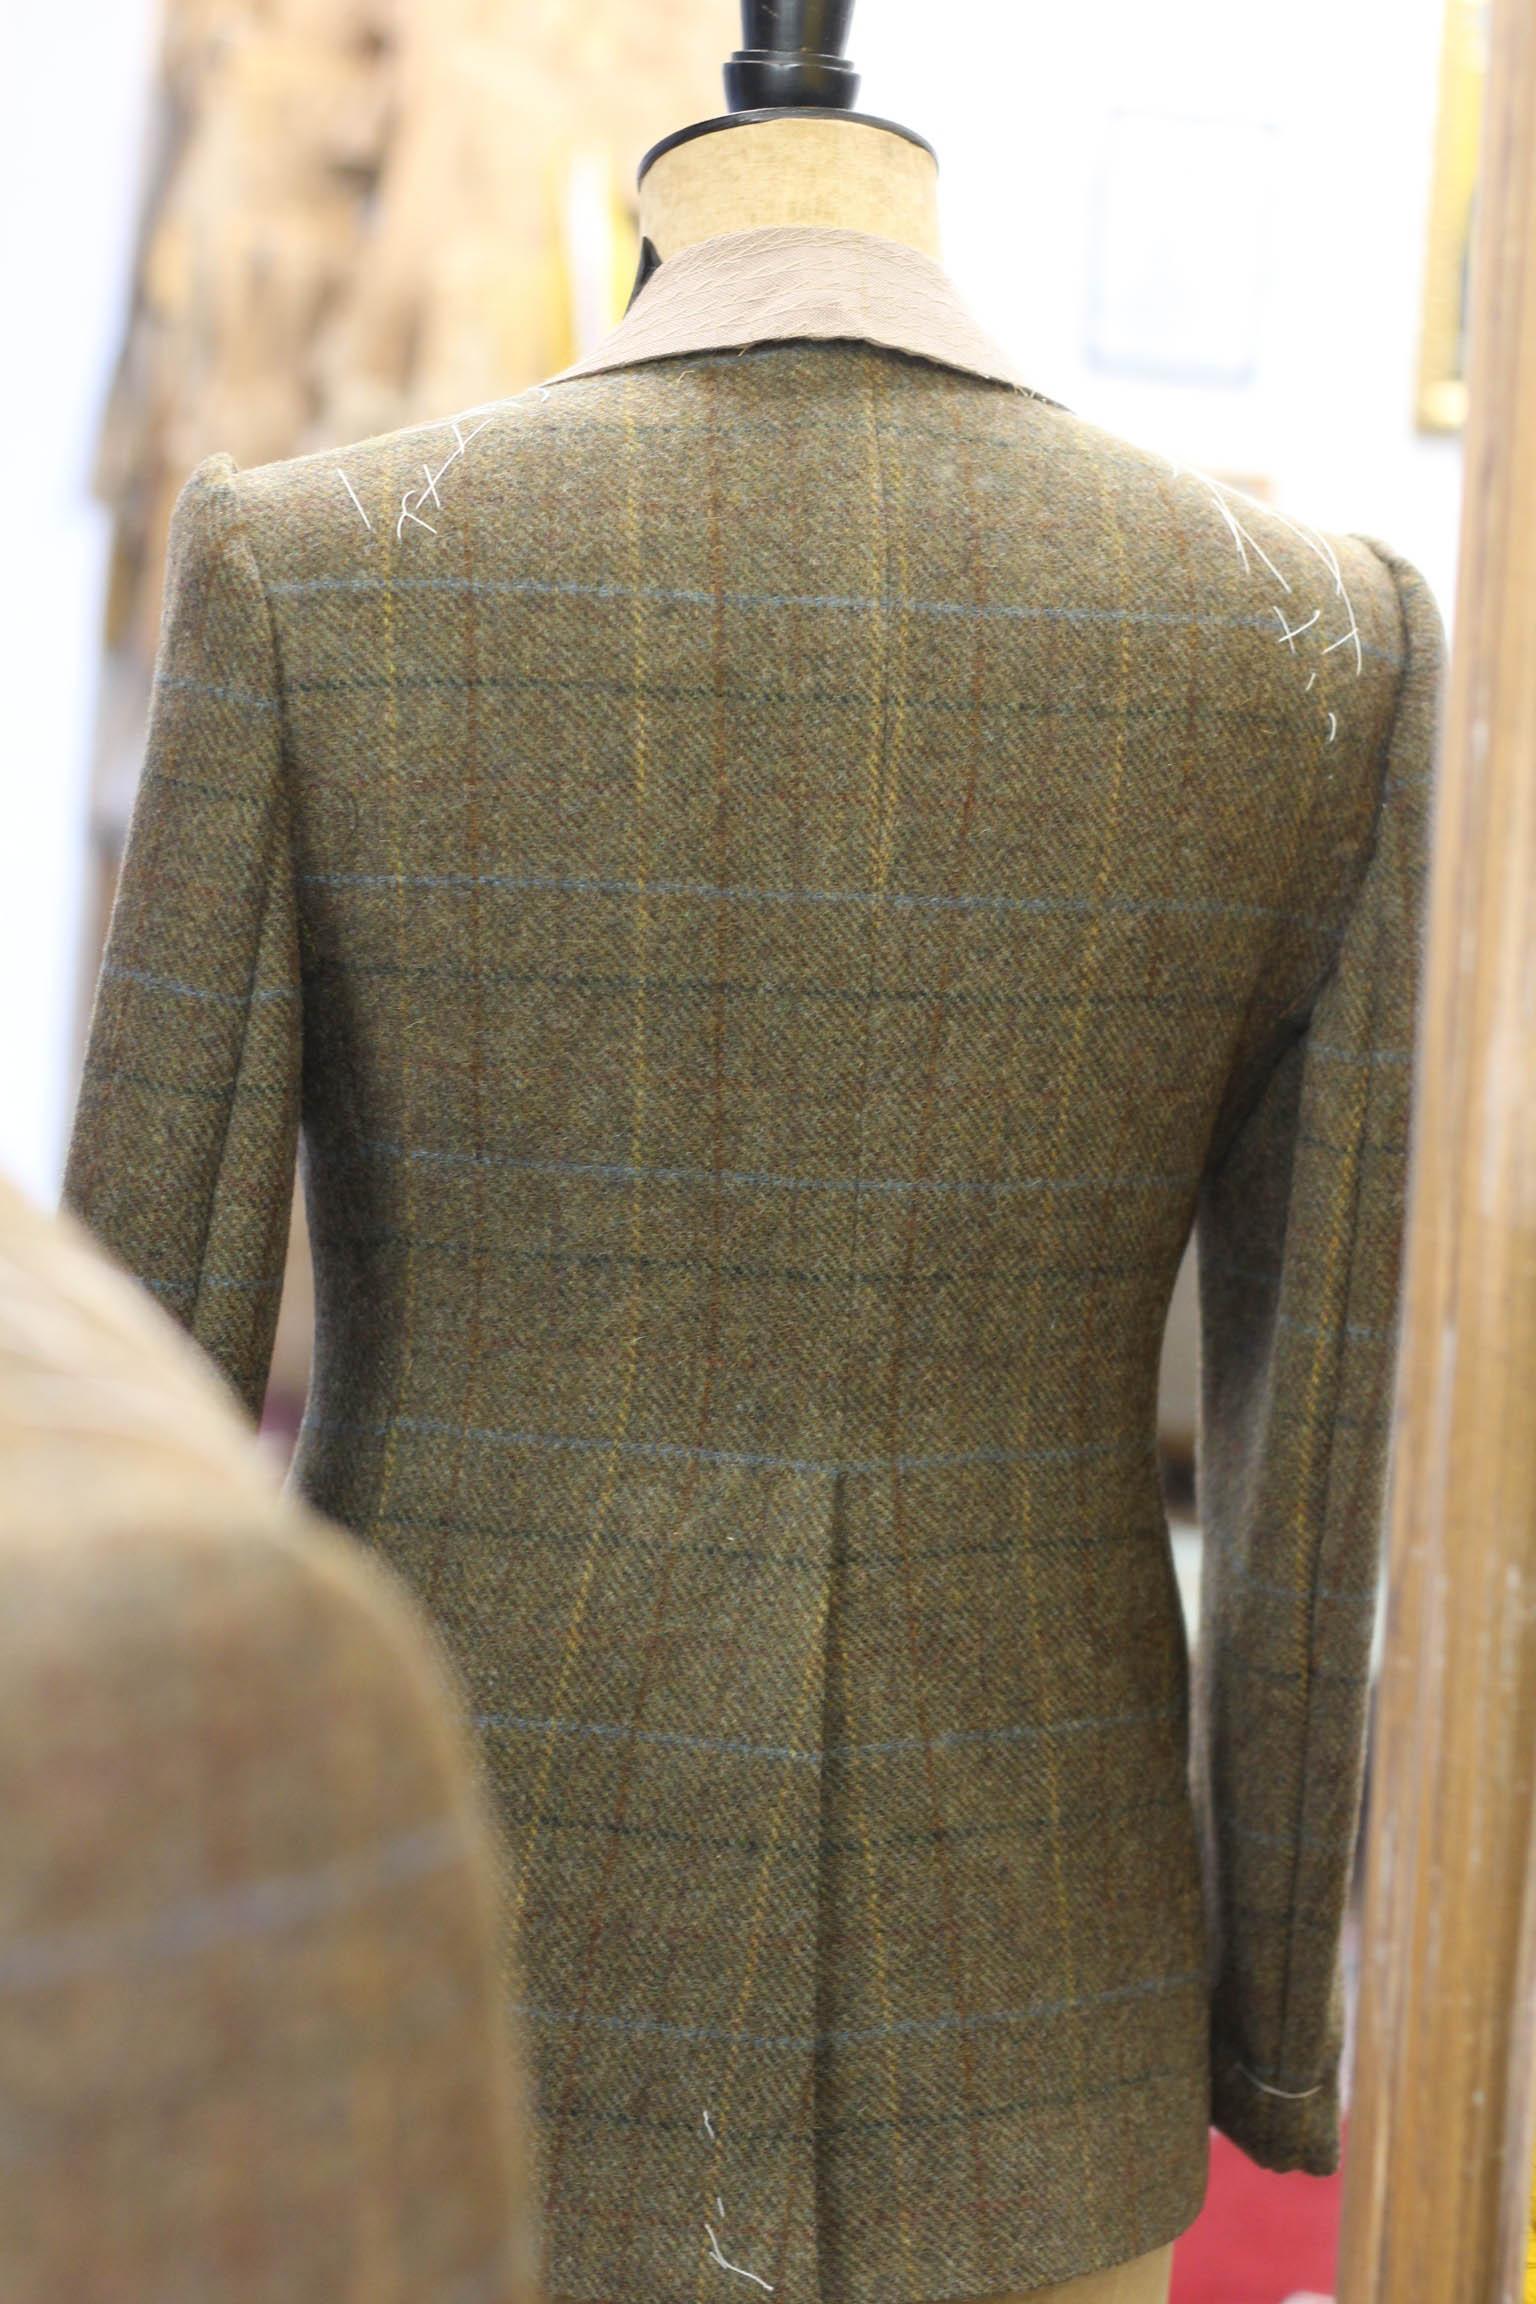 Ladies bespoke jackets